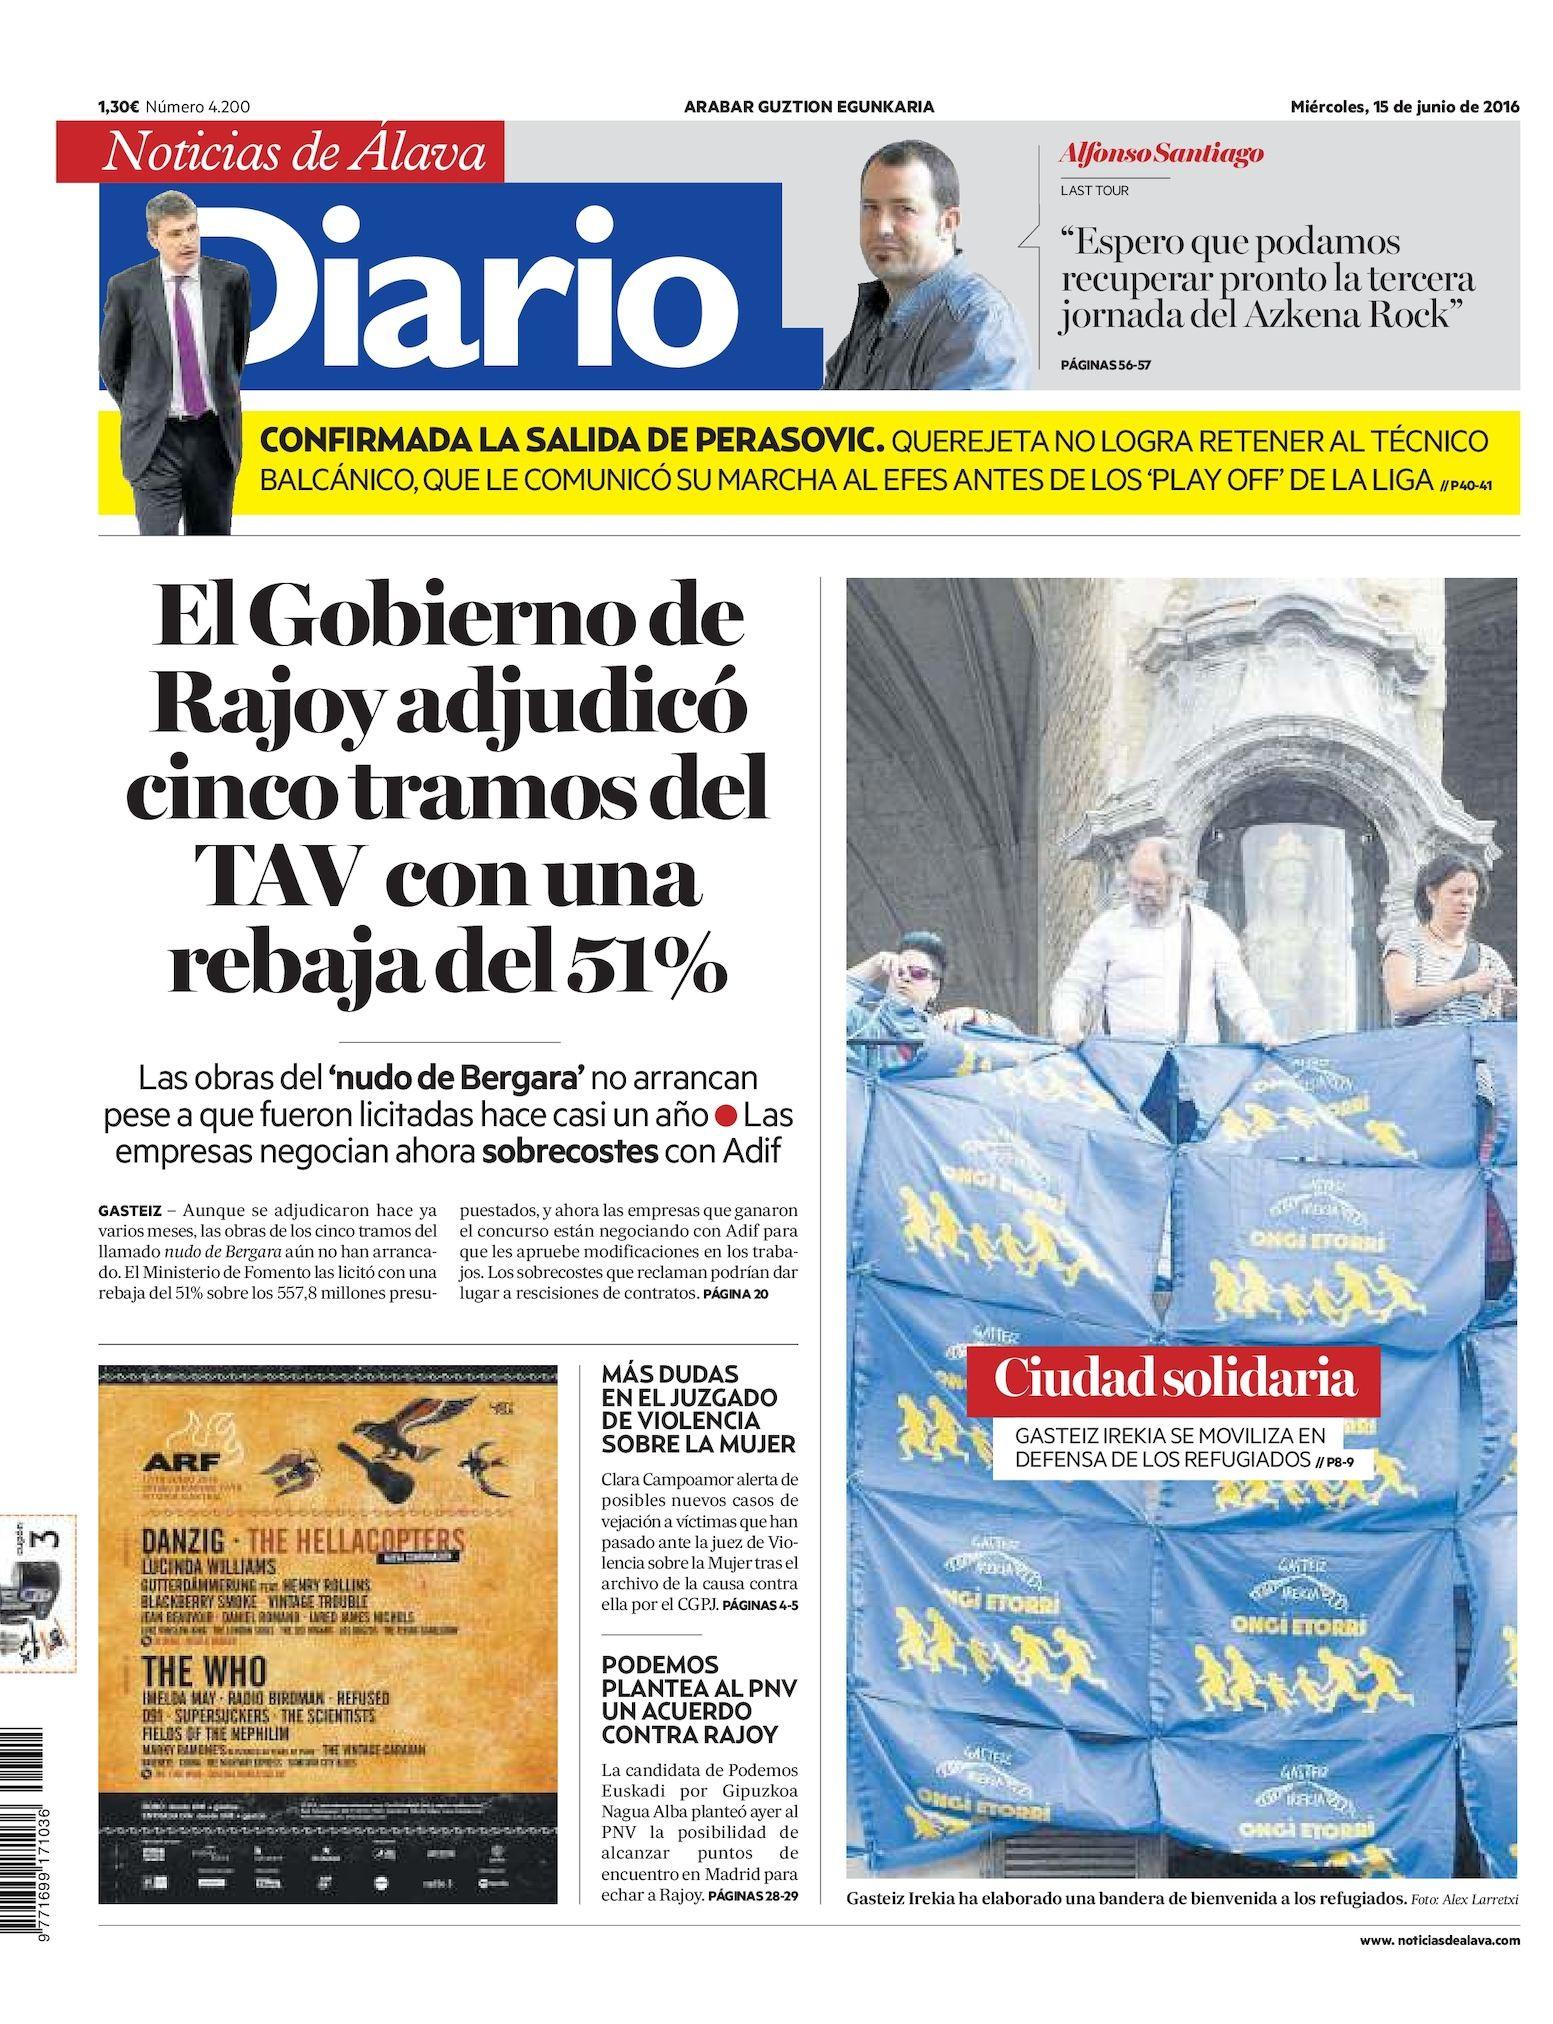 Calendario Escolar 2019 Galicia Ciga Más Reciente Calaméo Diario De Noticias De lava